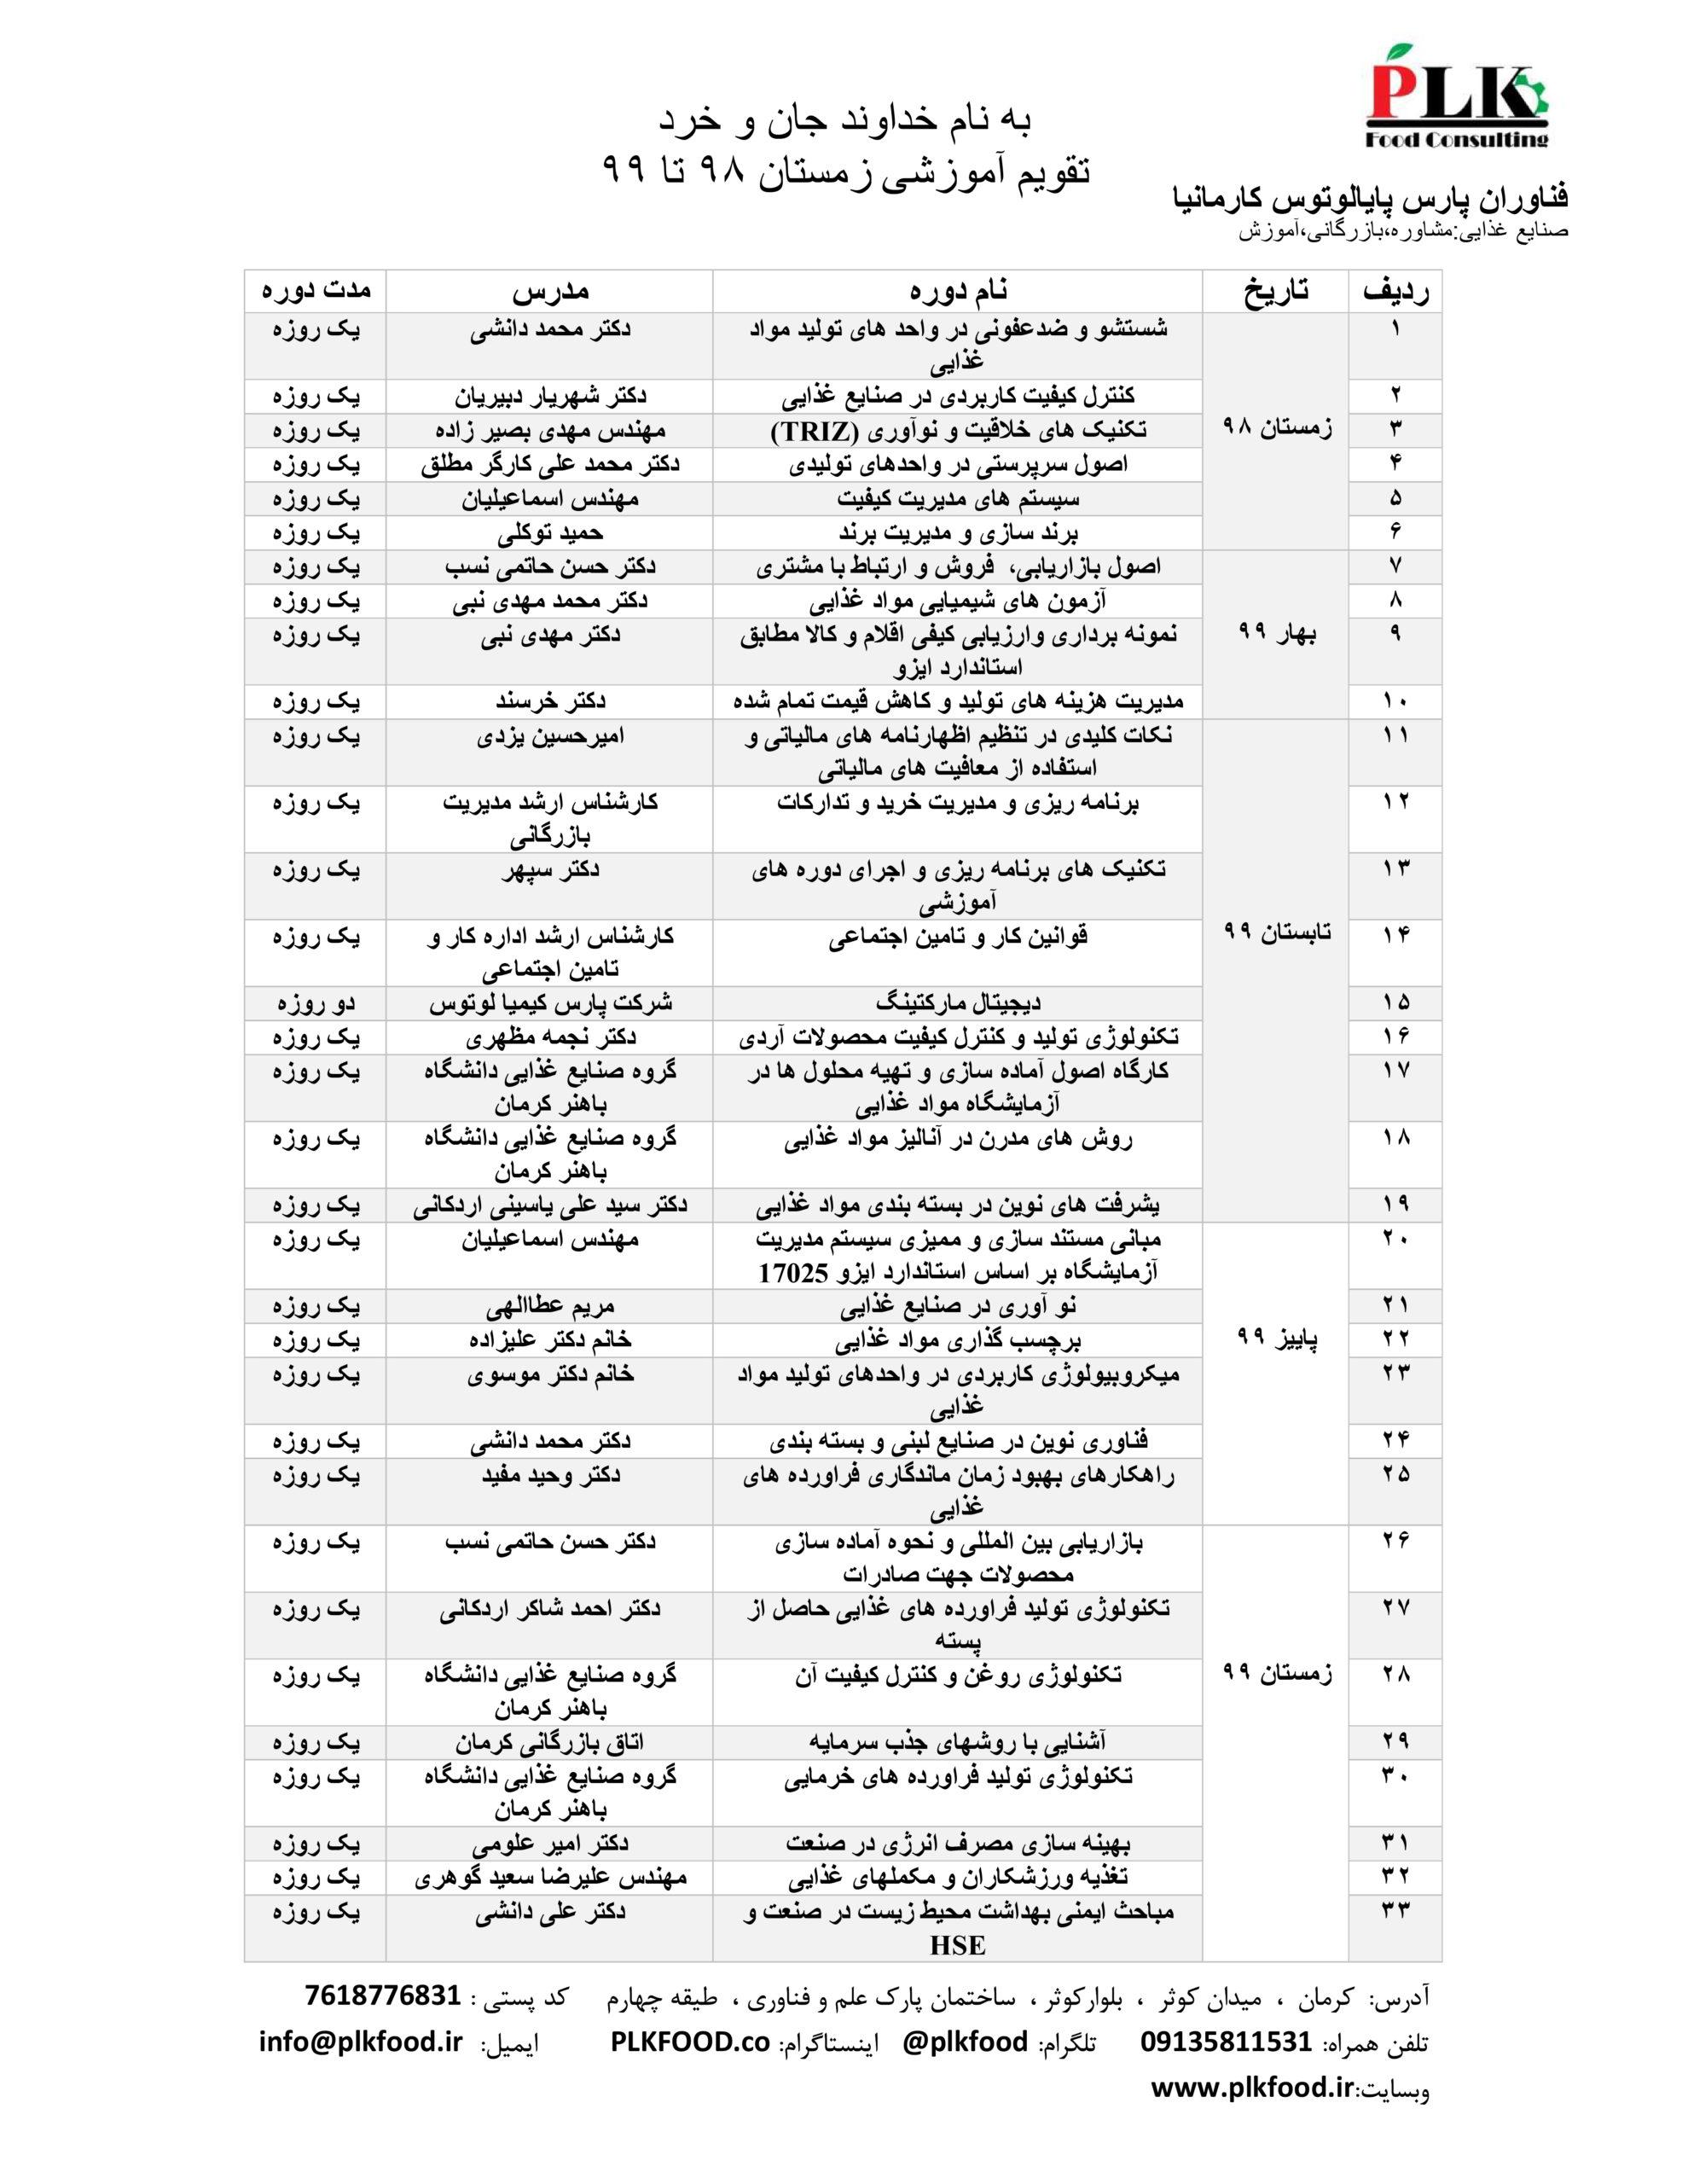 تقویم-آموزشی-زمستان-98-تا-زمستان-99-1f